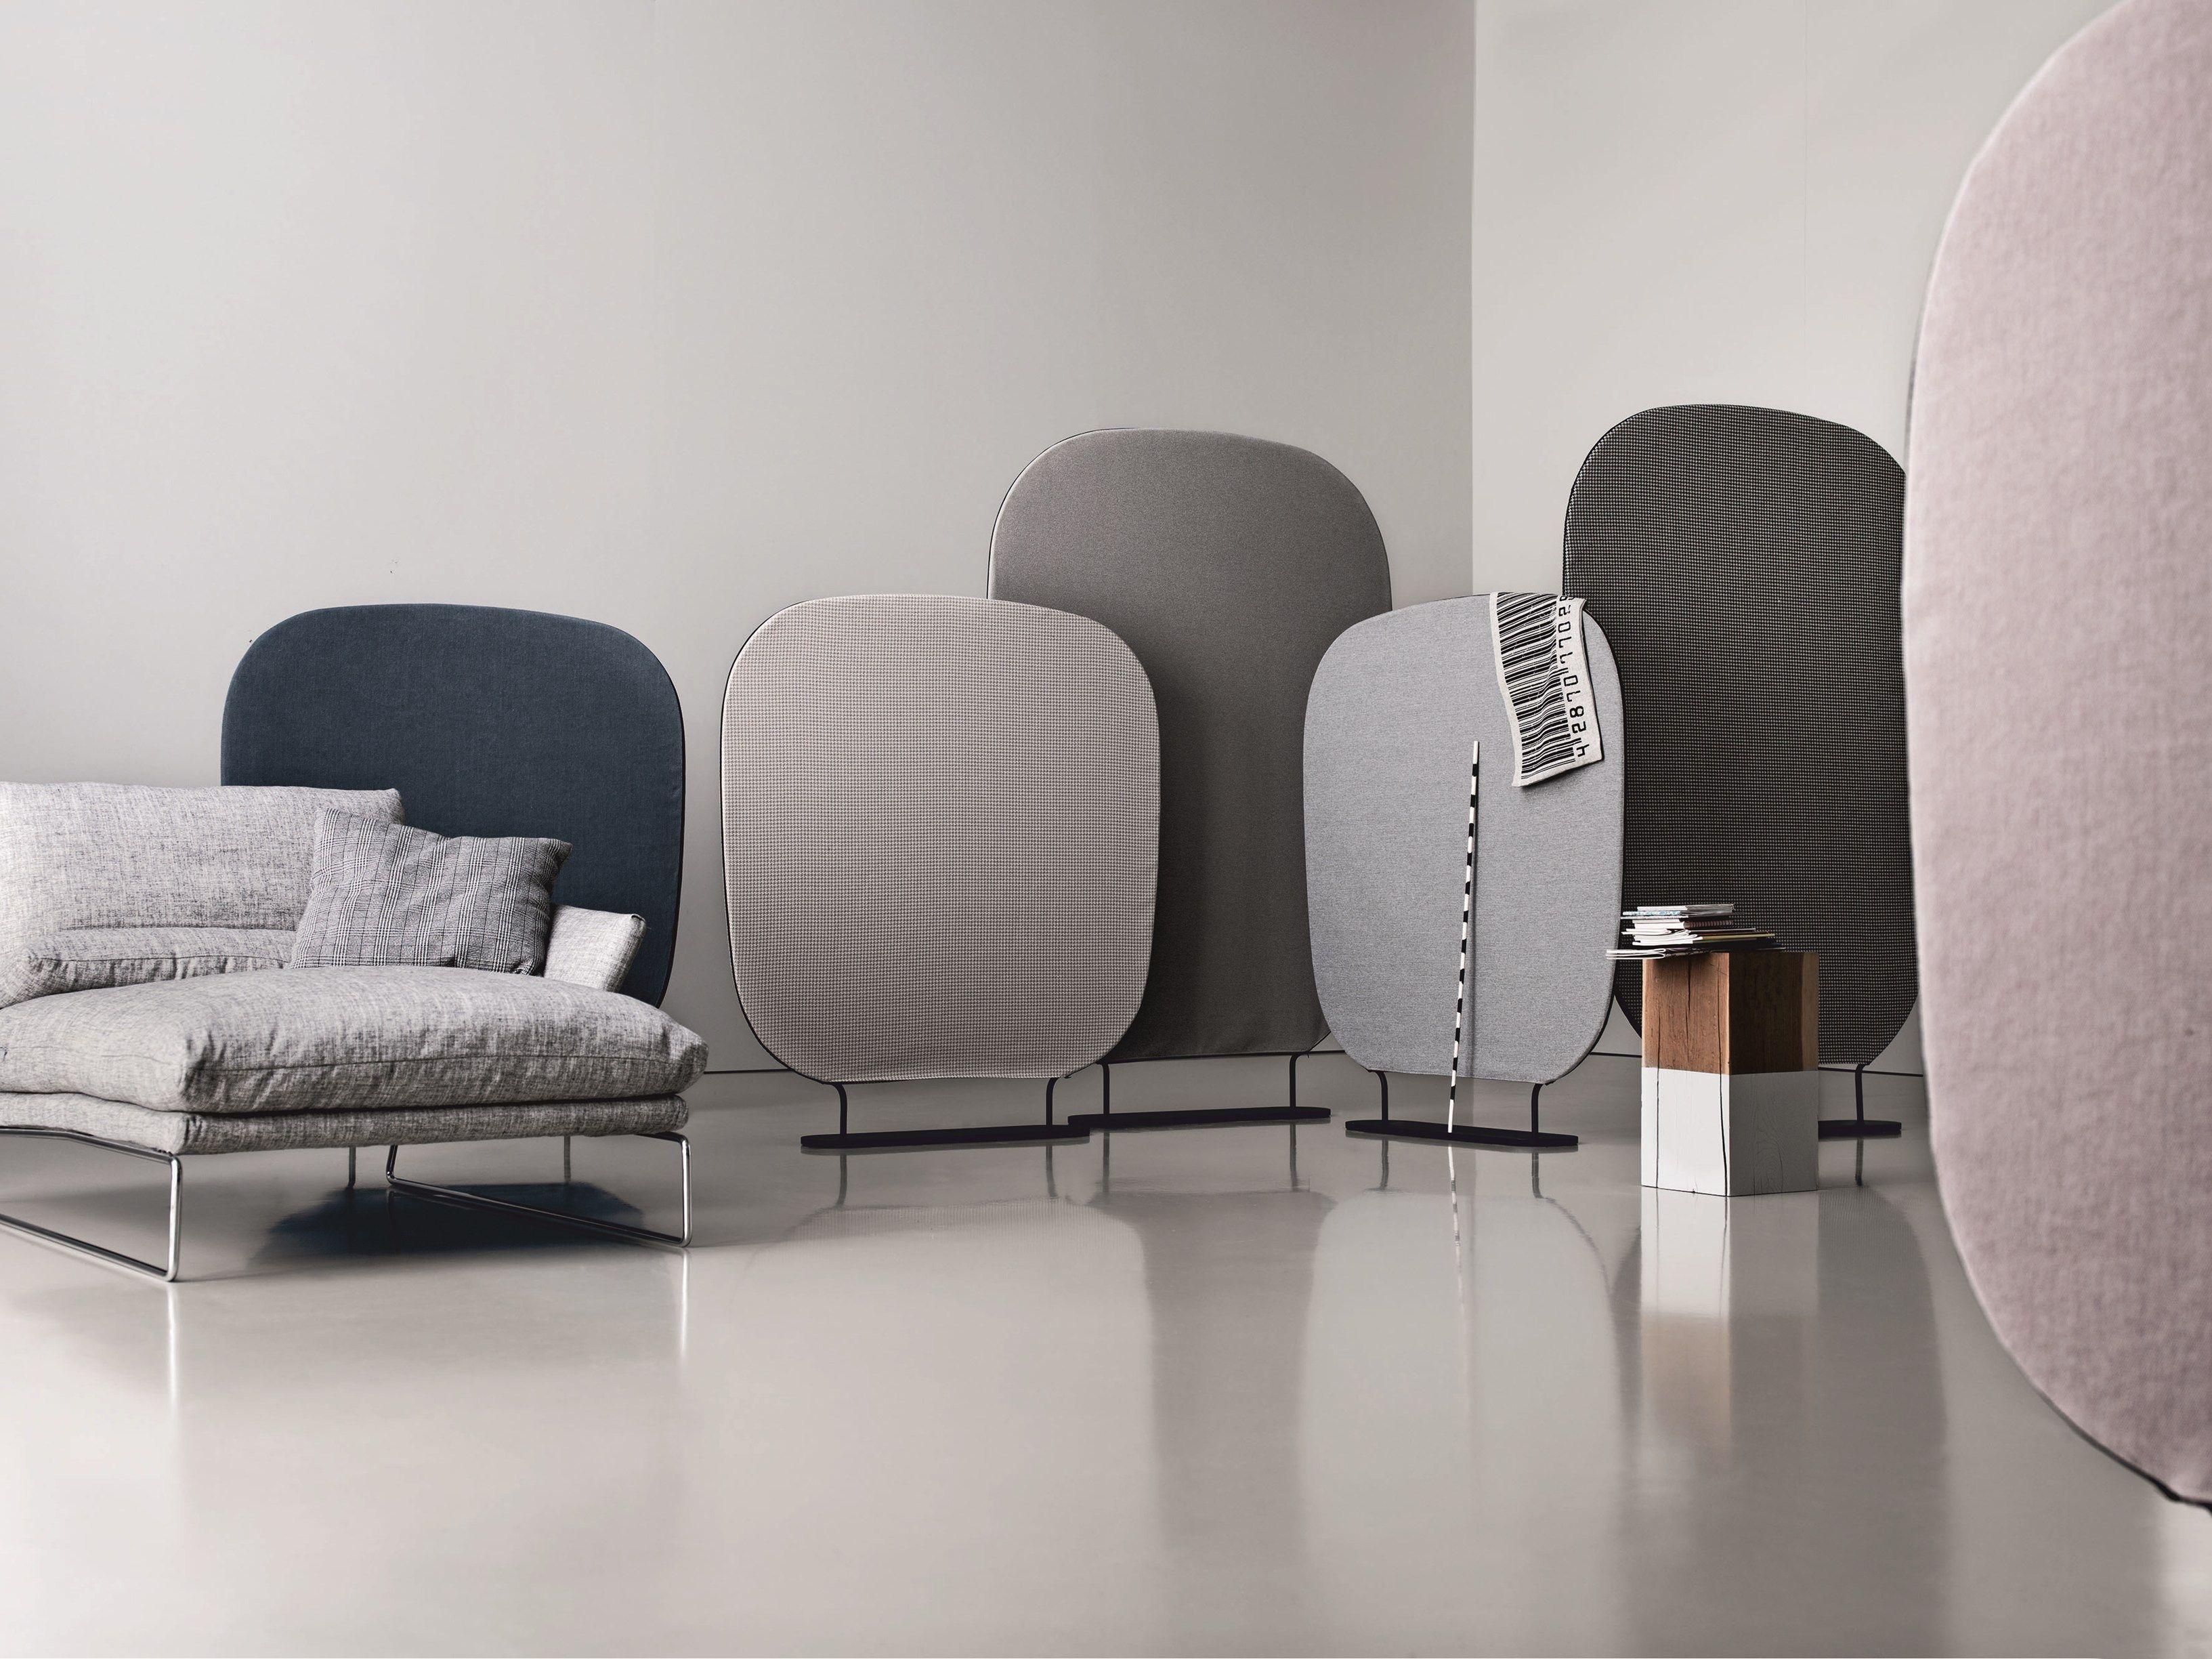 cloison en tissu shade by saba italia design marco zito cloisonnement pinterest paravent. Black Bedroom Furniture Sets. Home Design Ideas